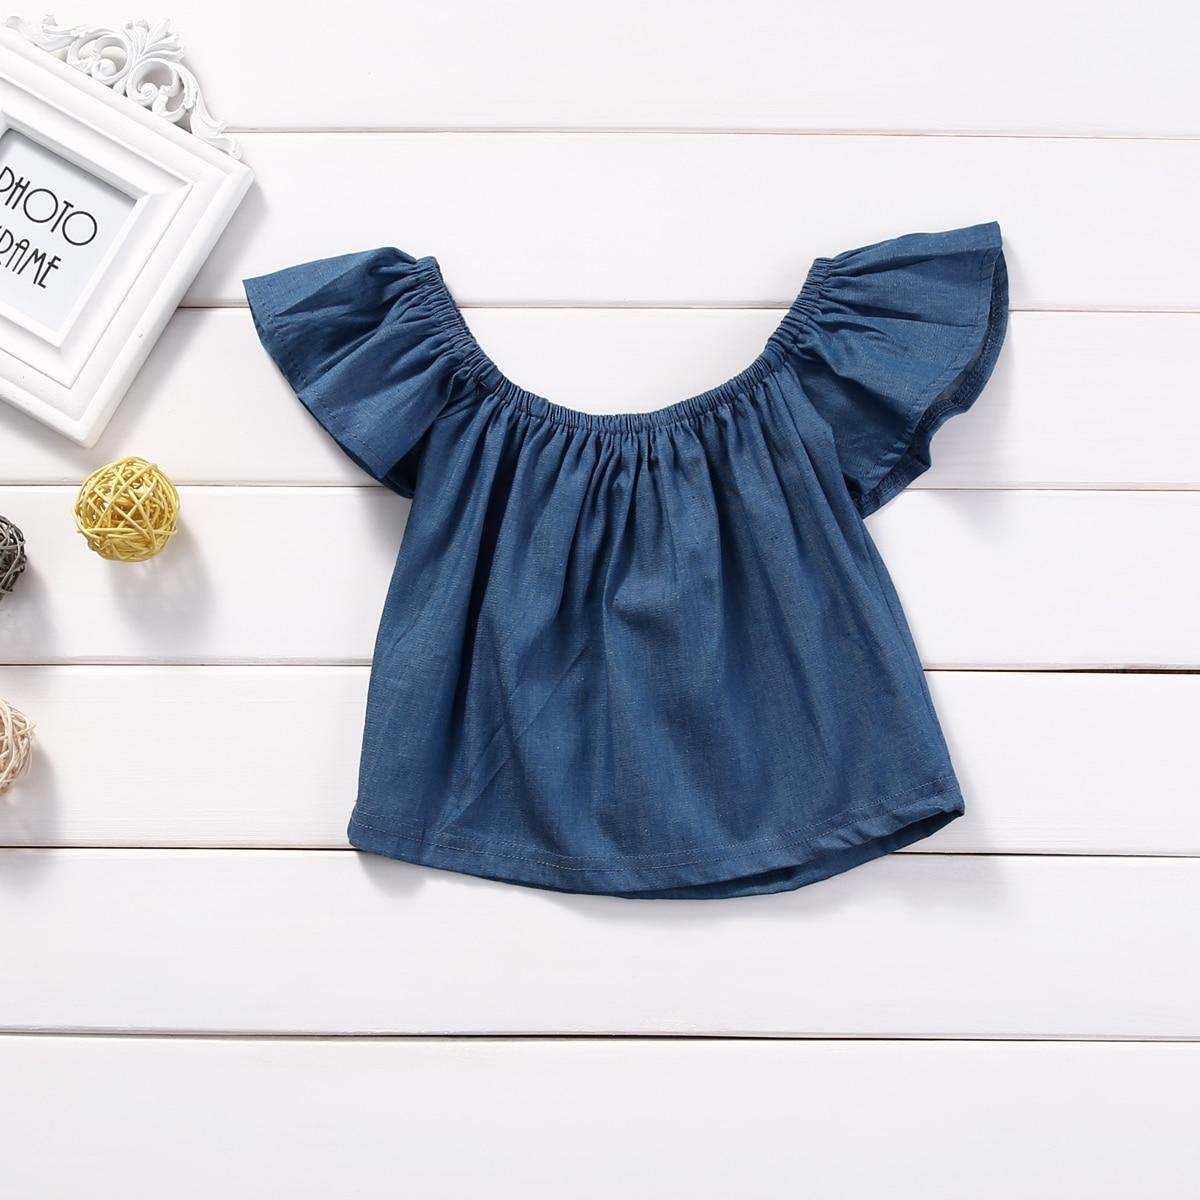 Toddler Newborn Baby Kid Girls Clothing Demin Off The